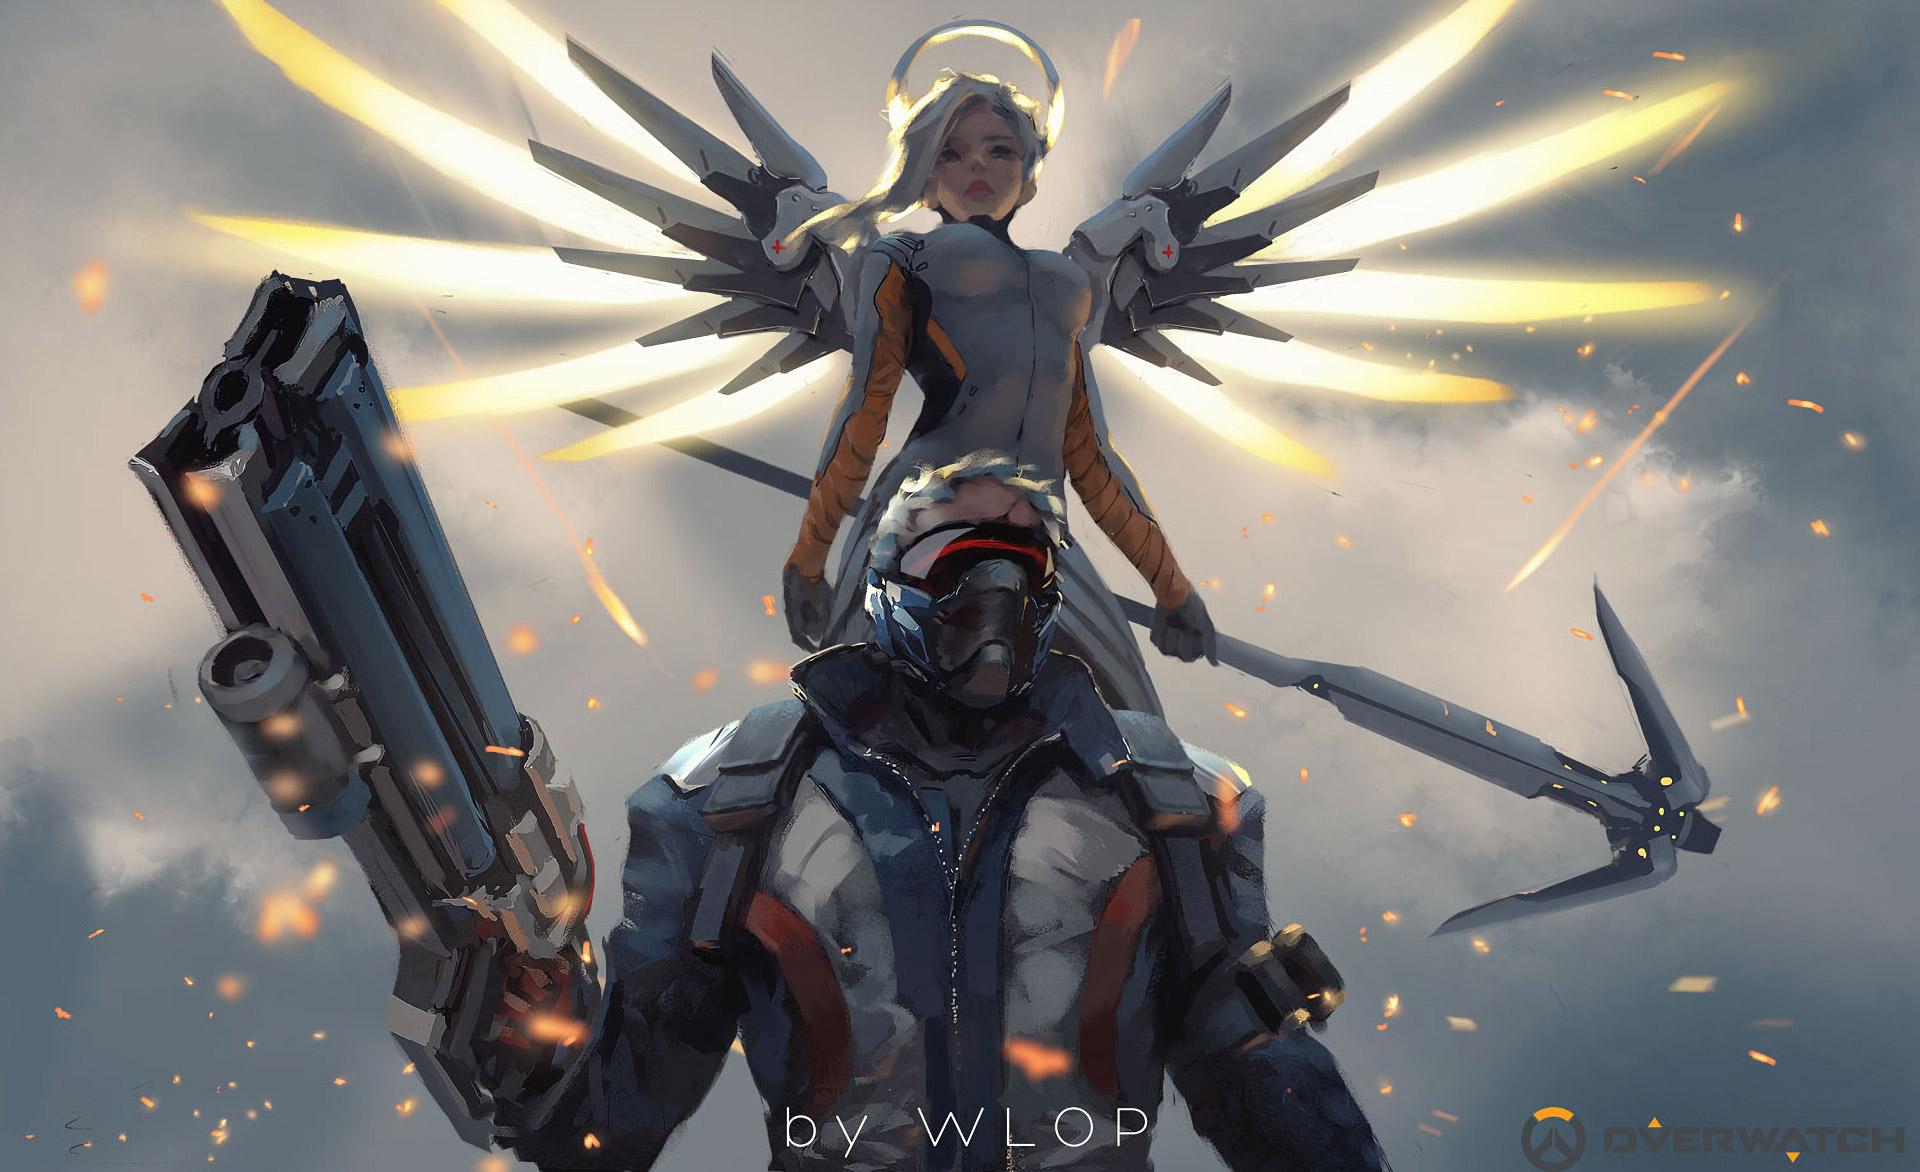 Truyện ngắn Overwatch: Valkyrie (phần 3)